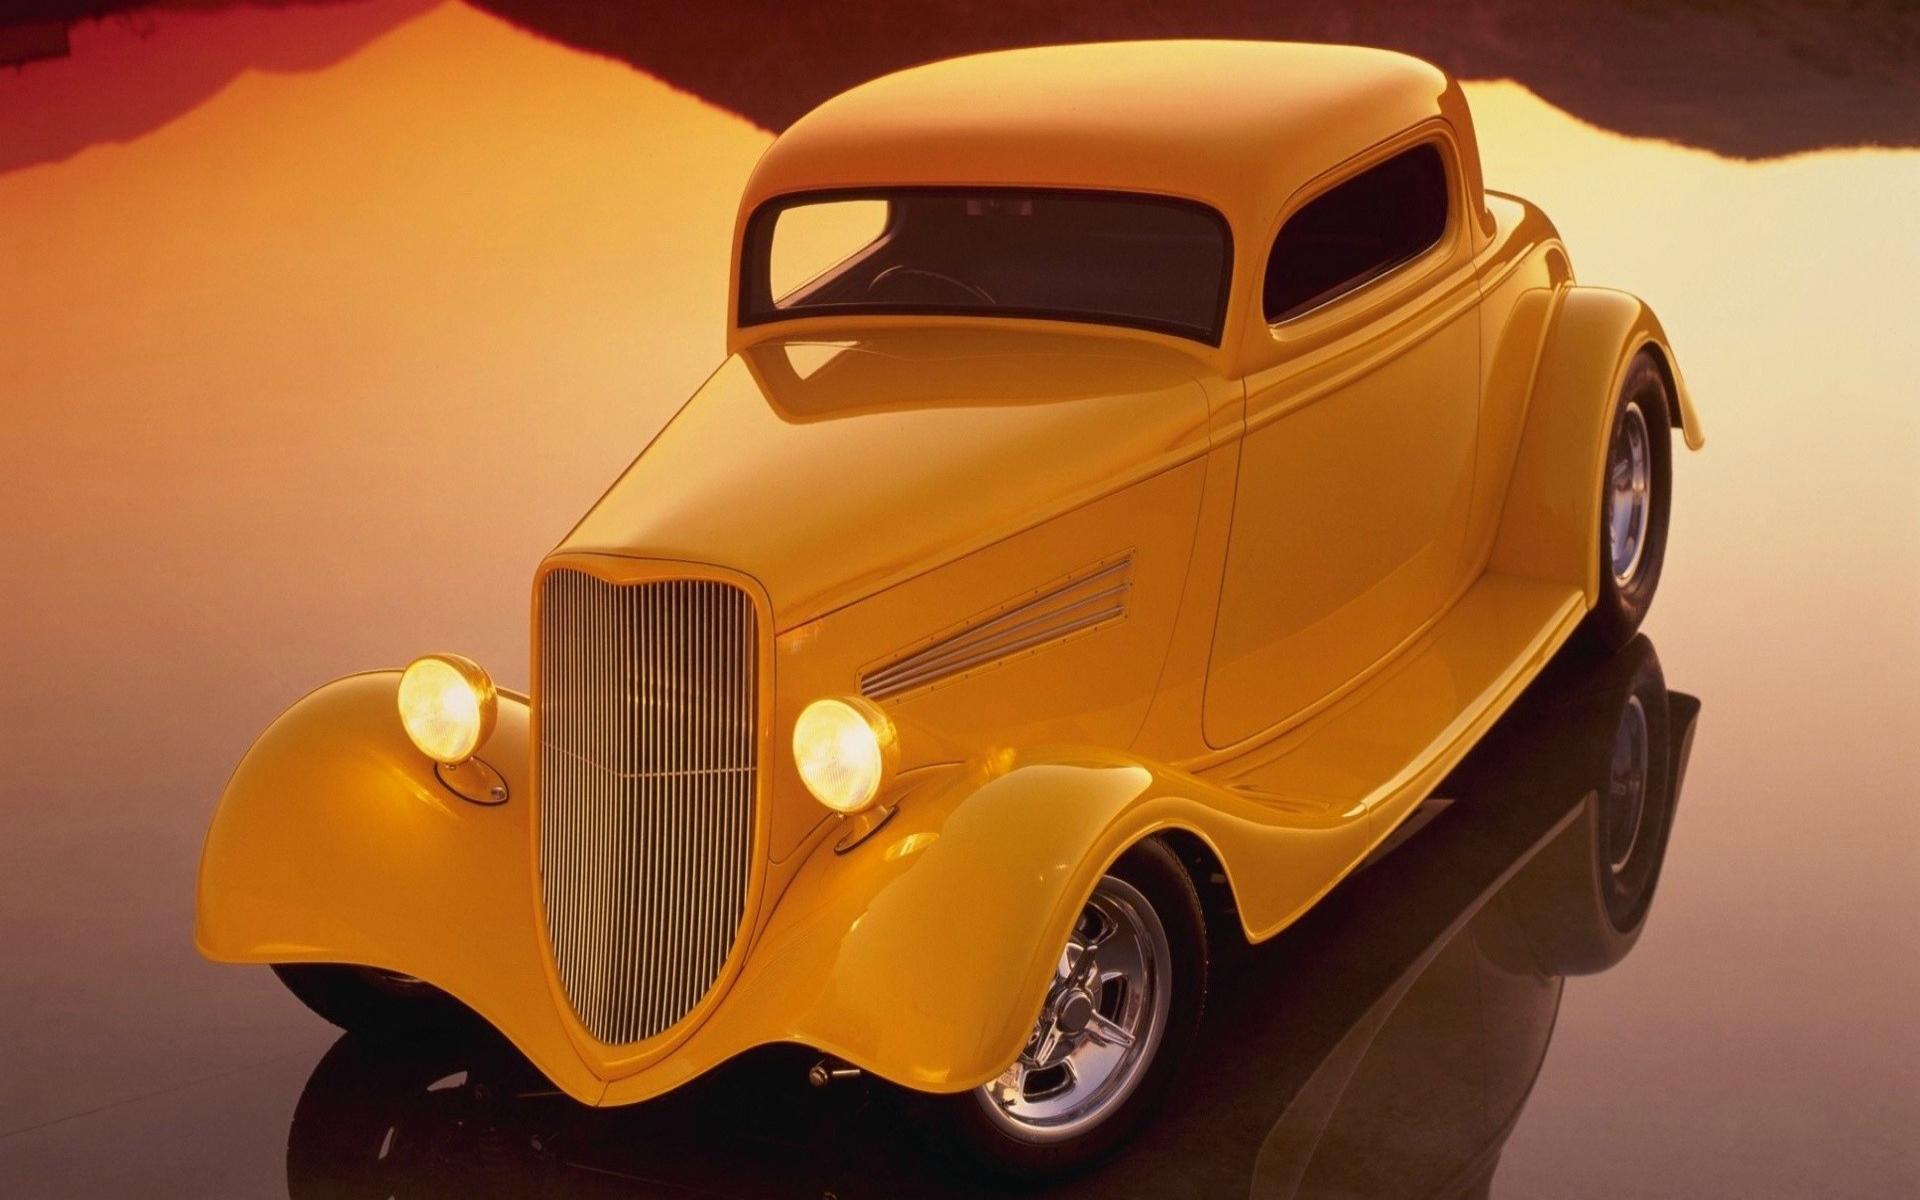 Retro Auto Hot Rod Custom Classic Cars Wallpaper